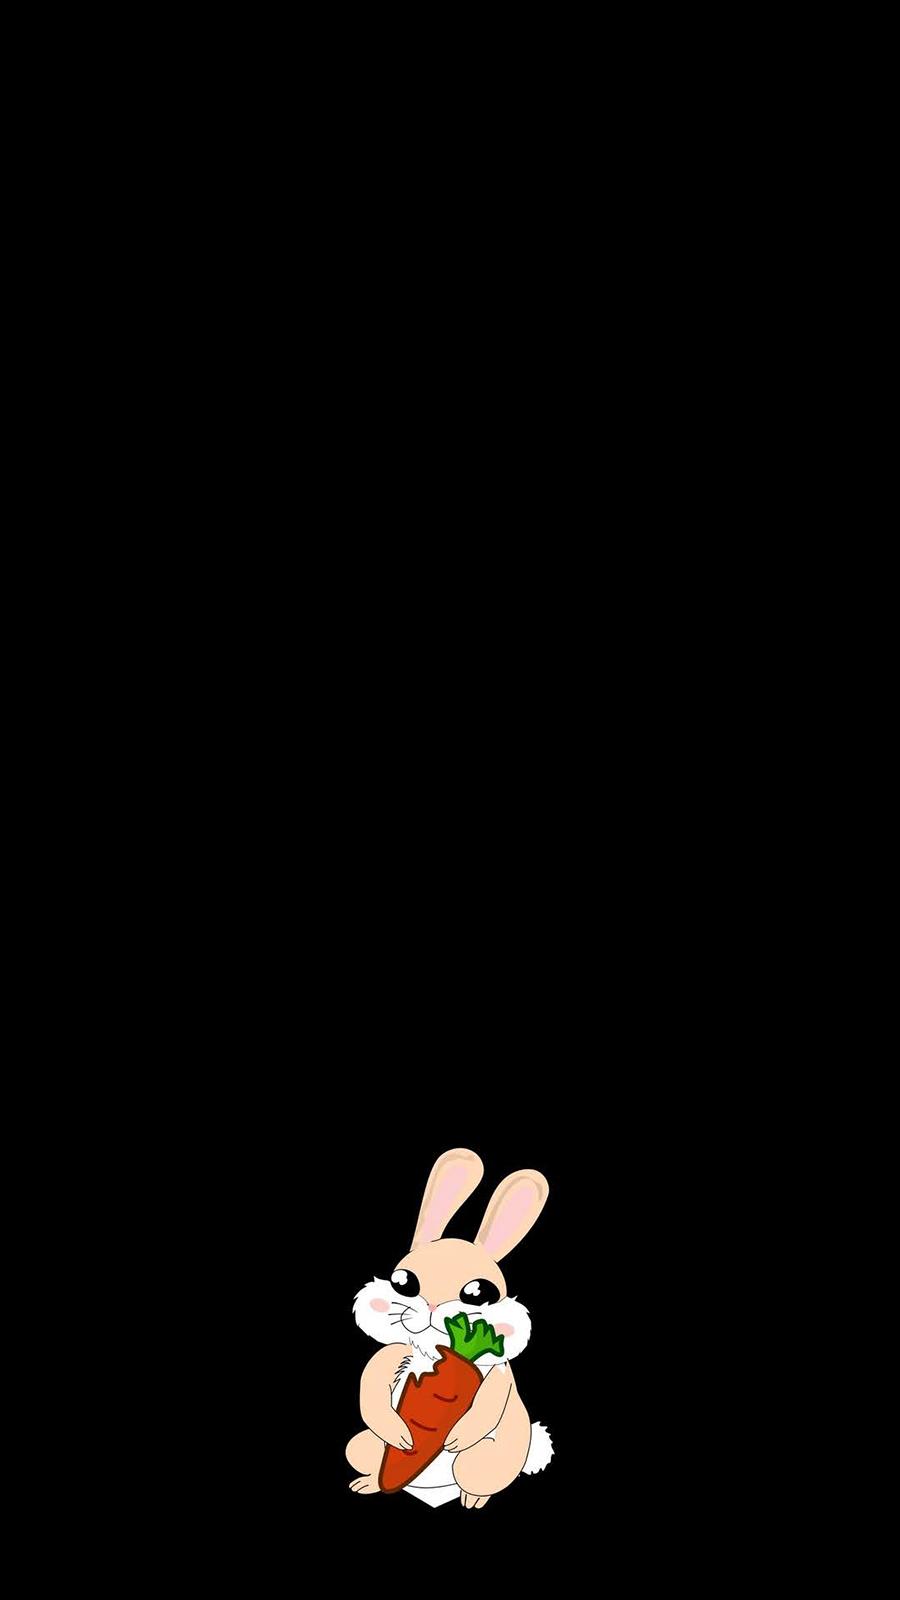 Cute Rabbit Wallpapers Free Download